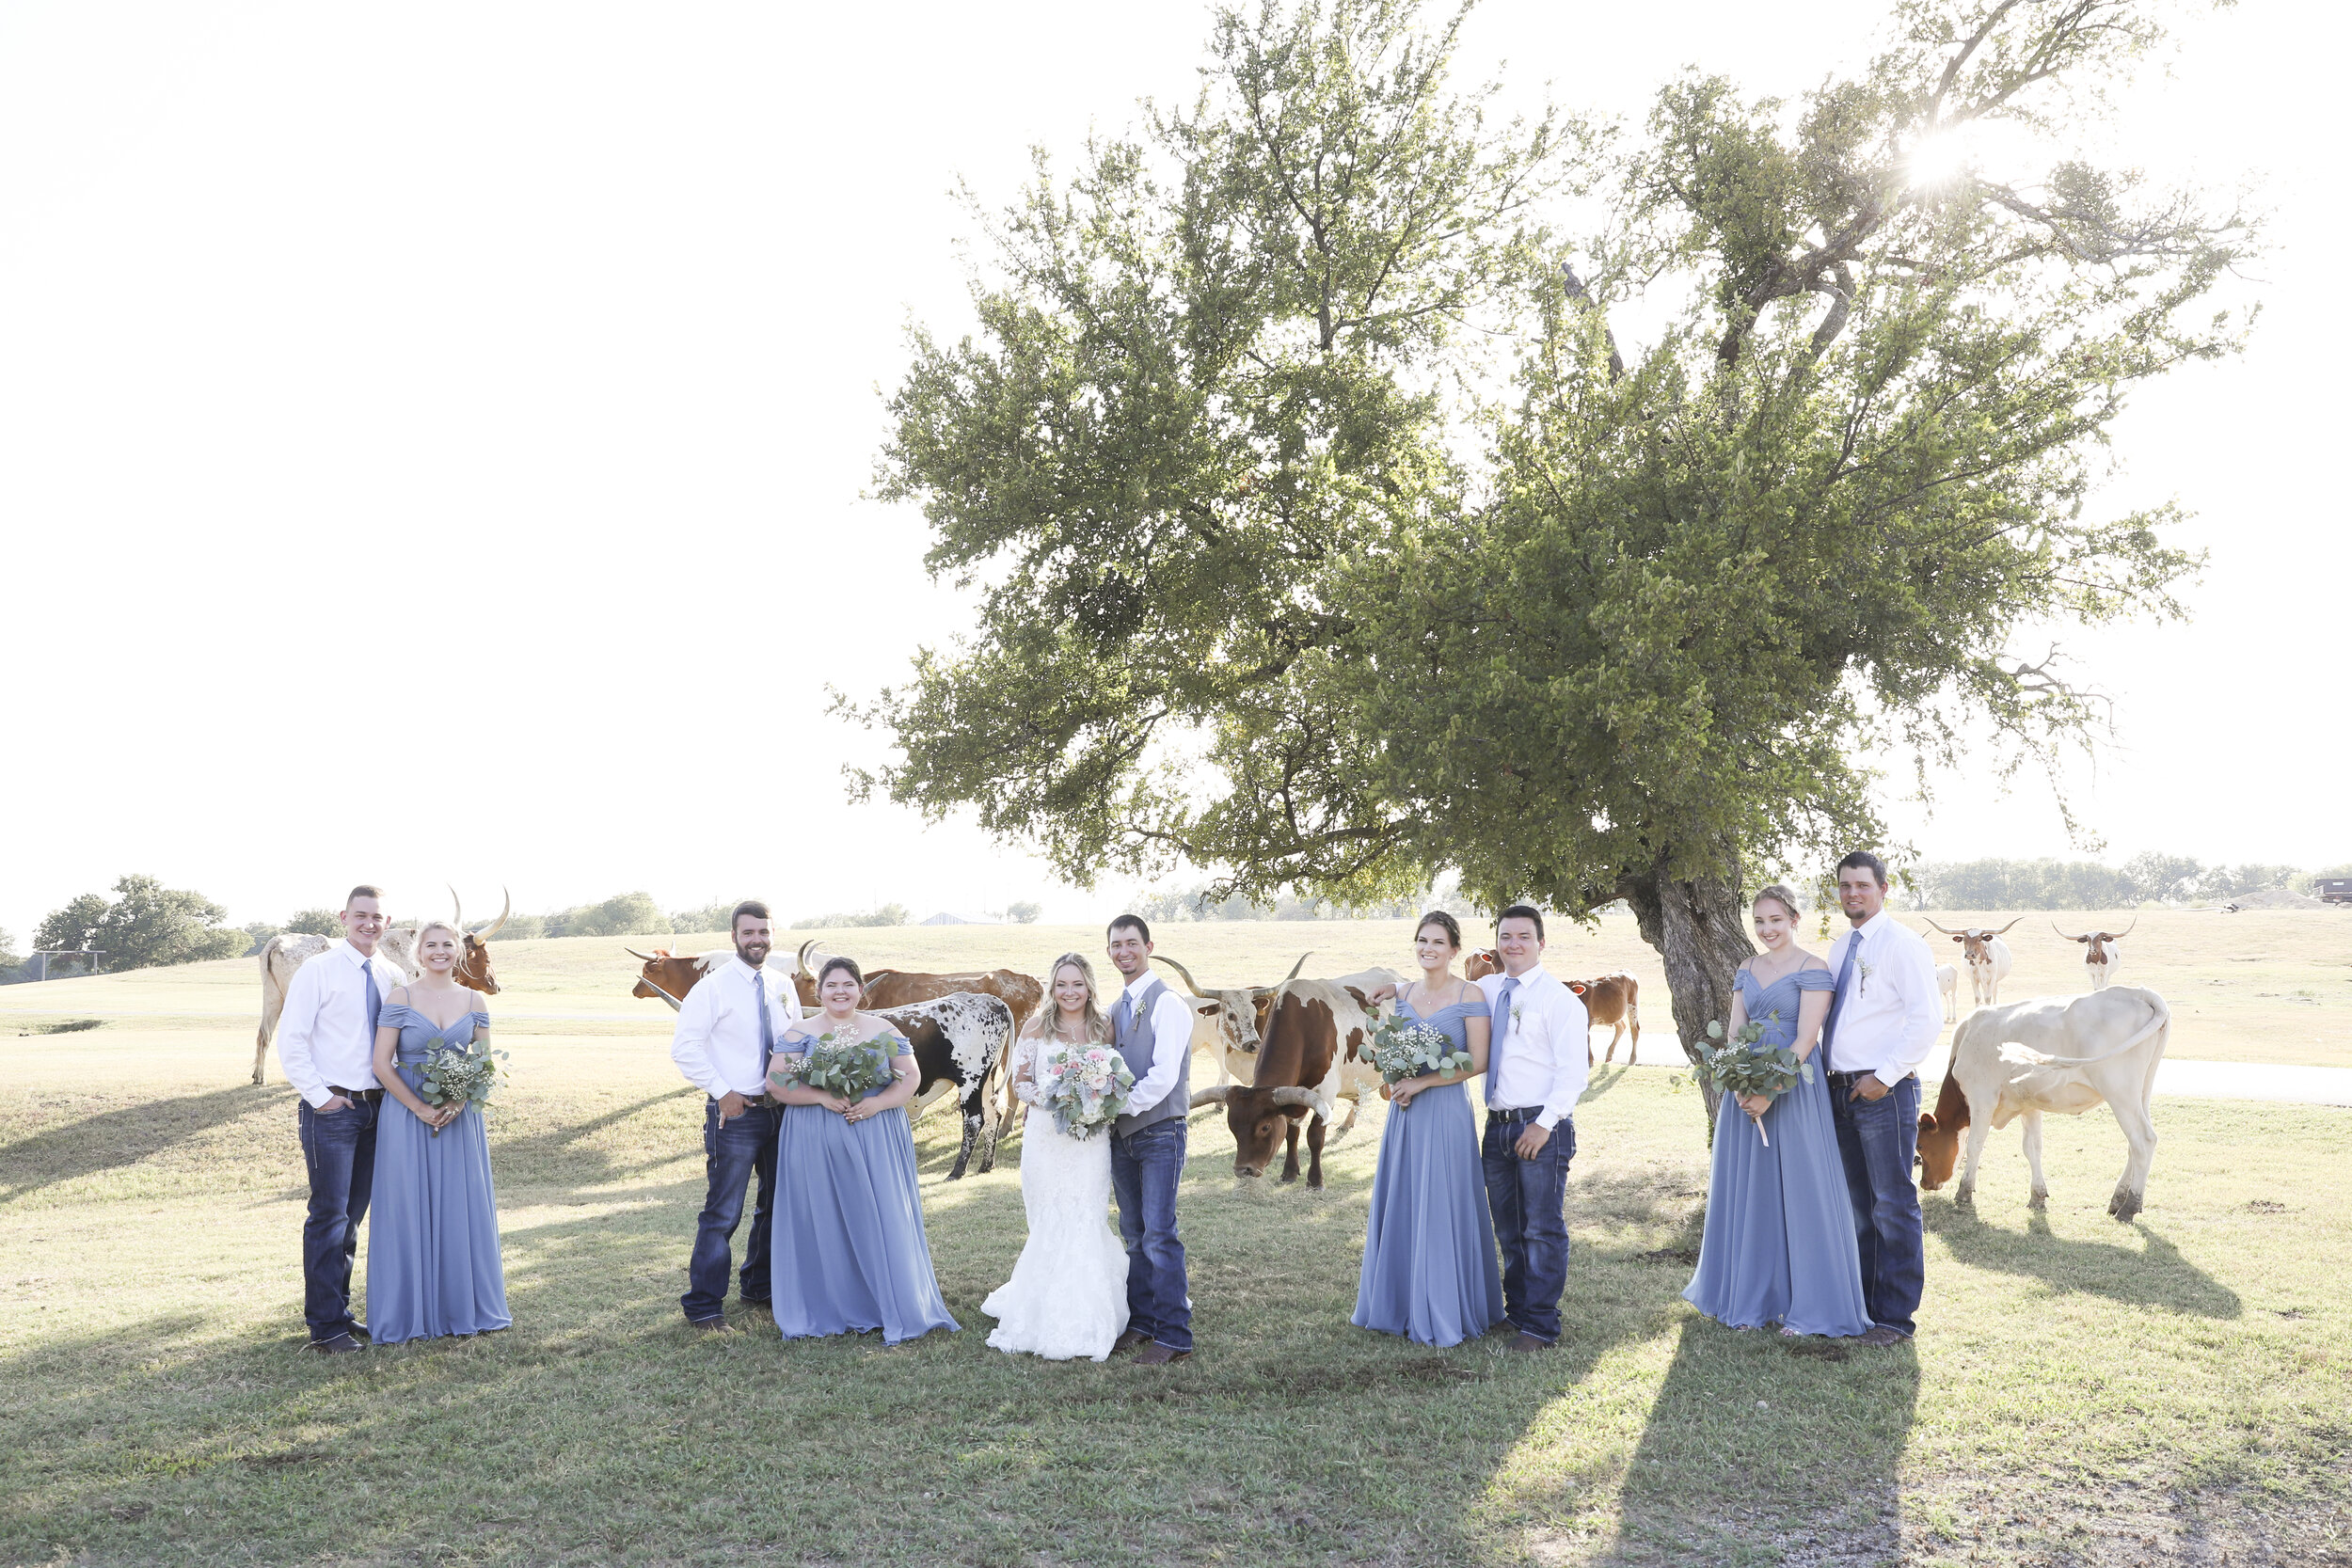 RandiMichelle_GannWedding_Wedding Portraits-21.jpg